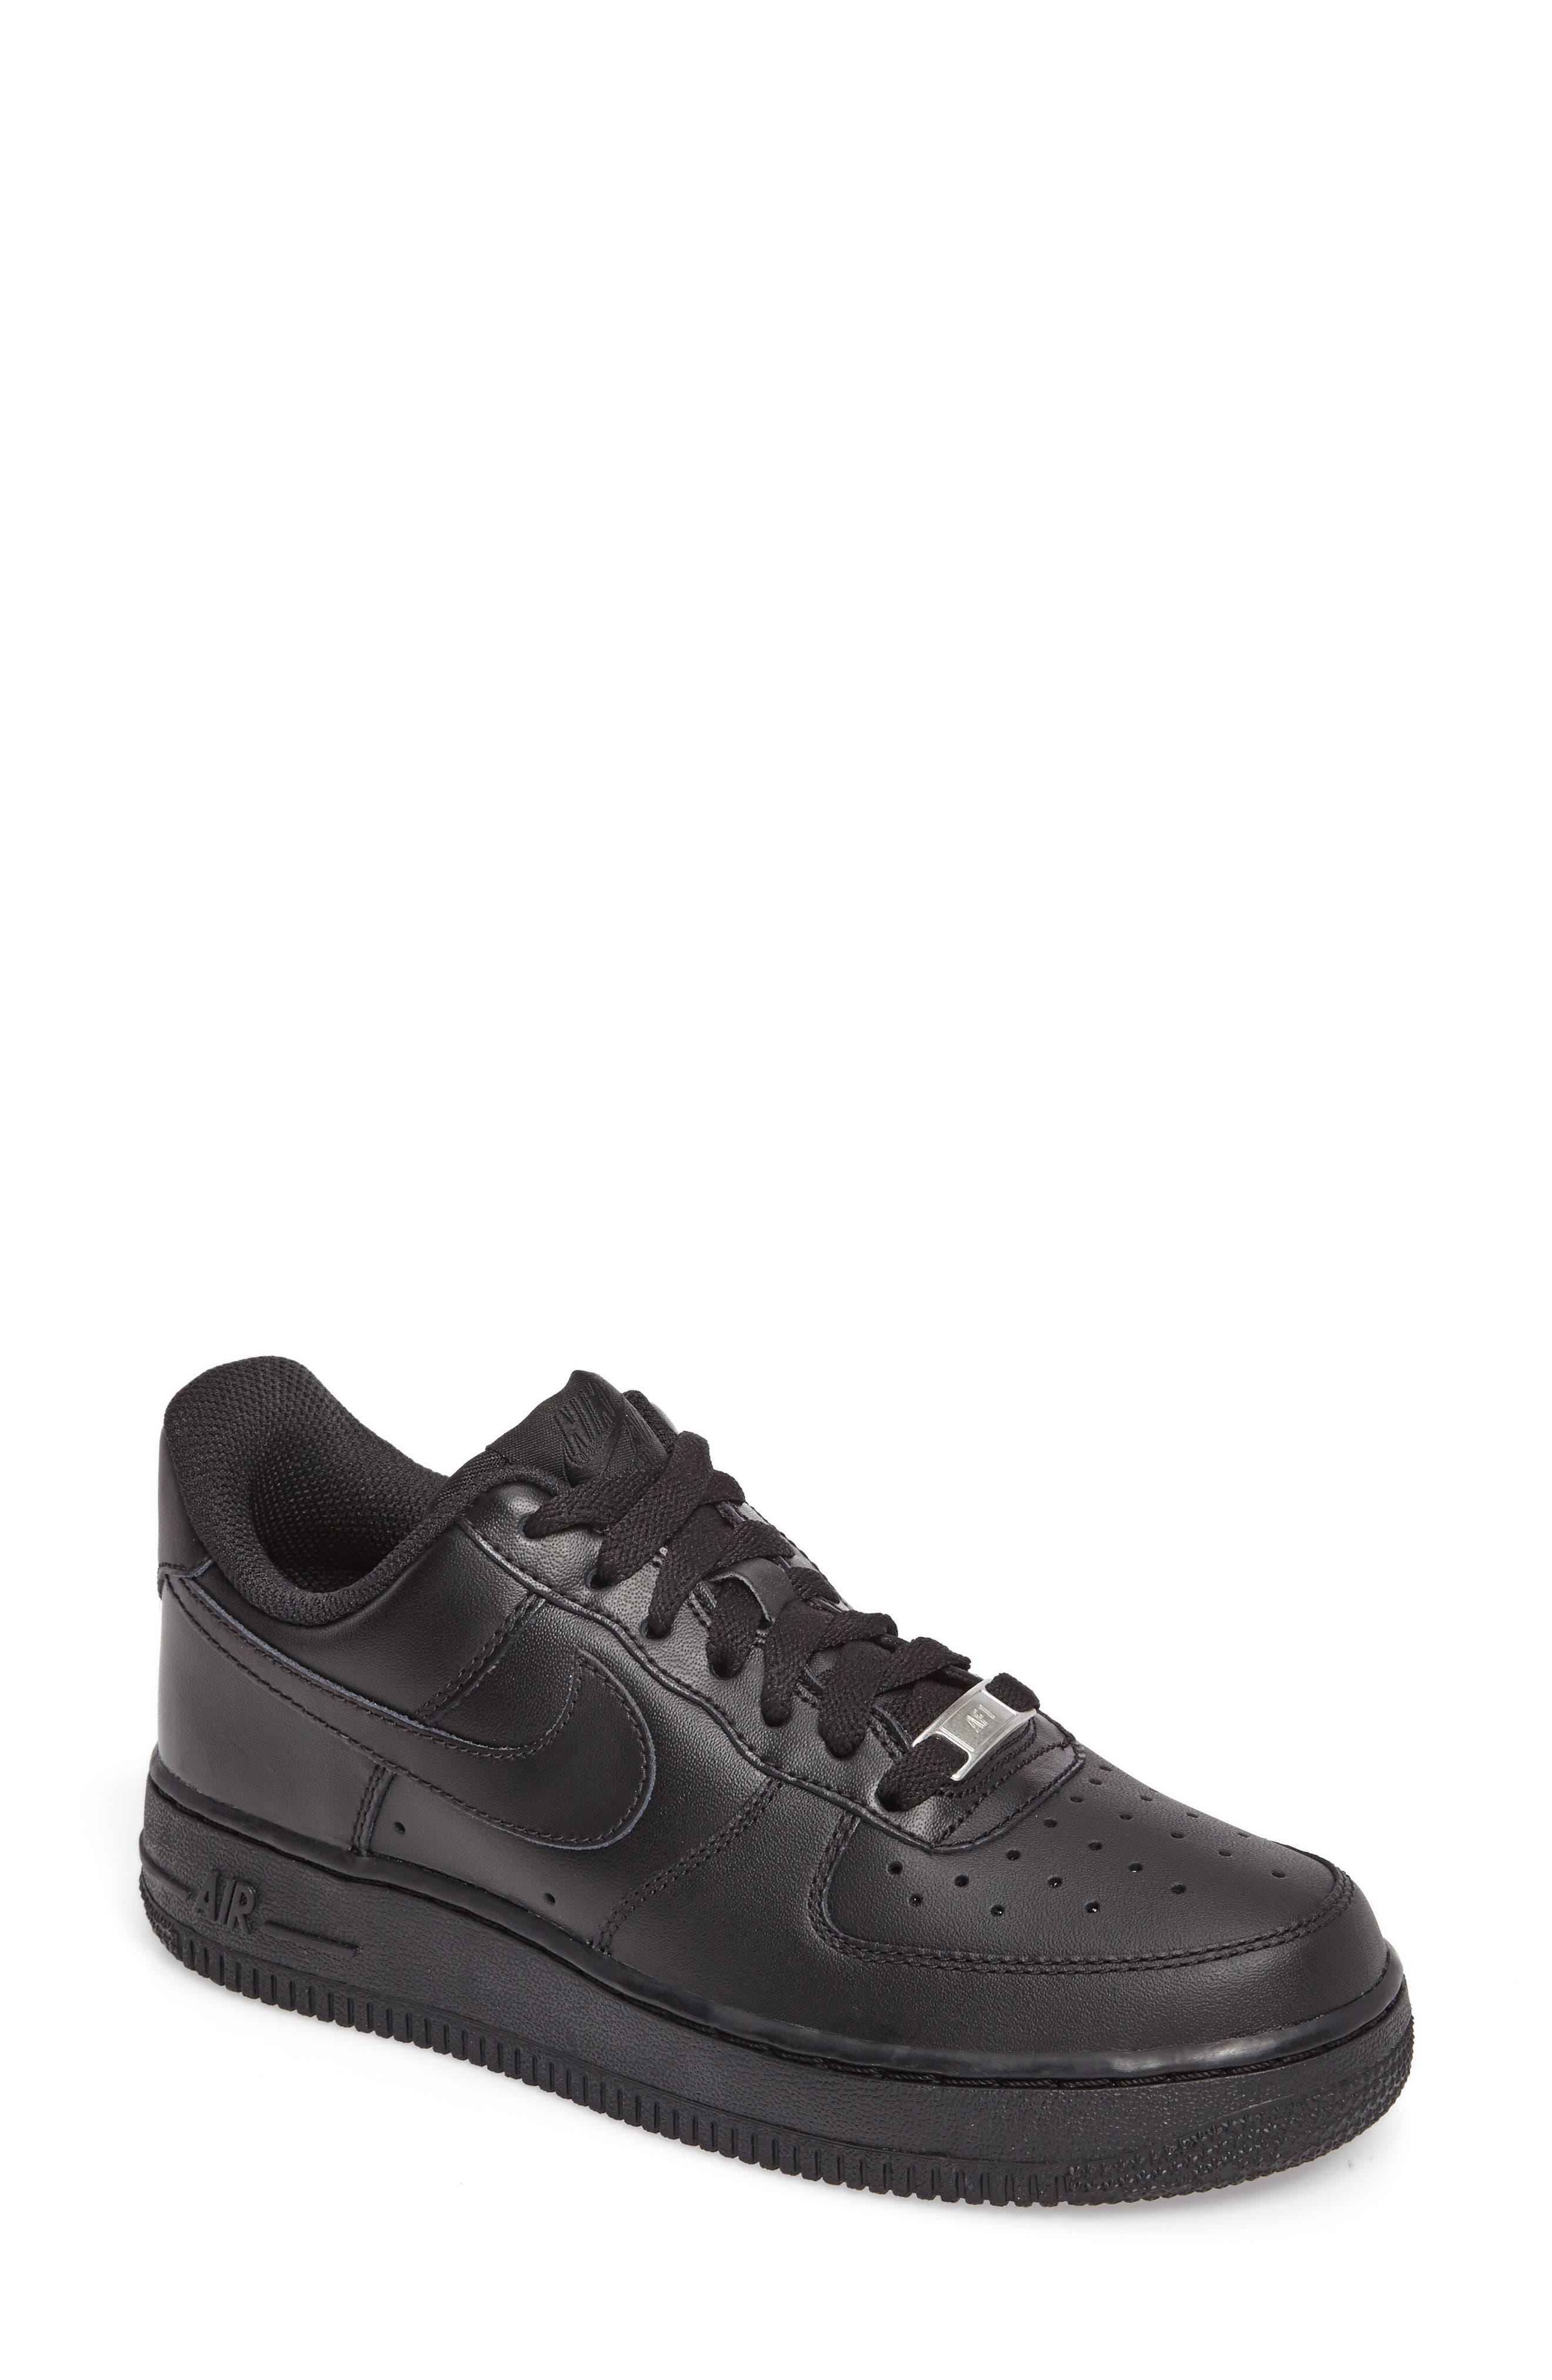 'Air Force 1' Basketball Sneaker,                             Main thumbnail 1, color,                             BLACK/ BLACK